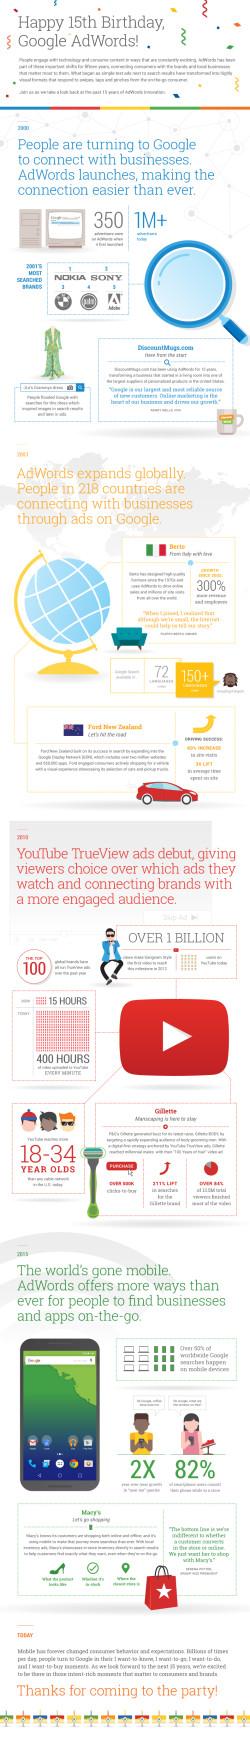 AdWords_Birthday_Infographic_Final_v2